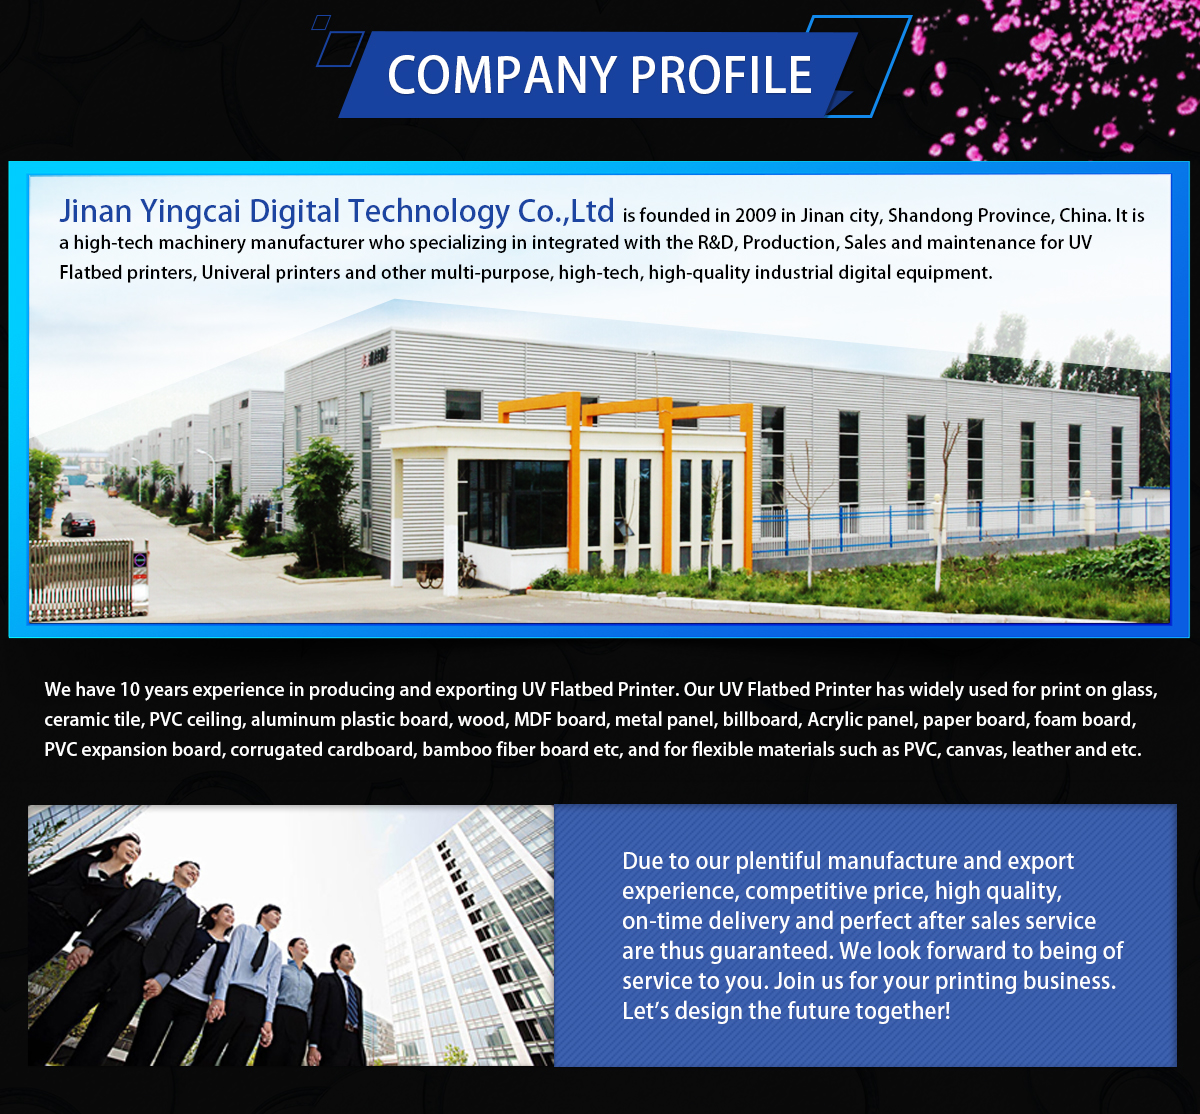 Jinan Yingcai Digital Technology Co Ltd